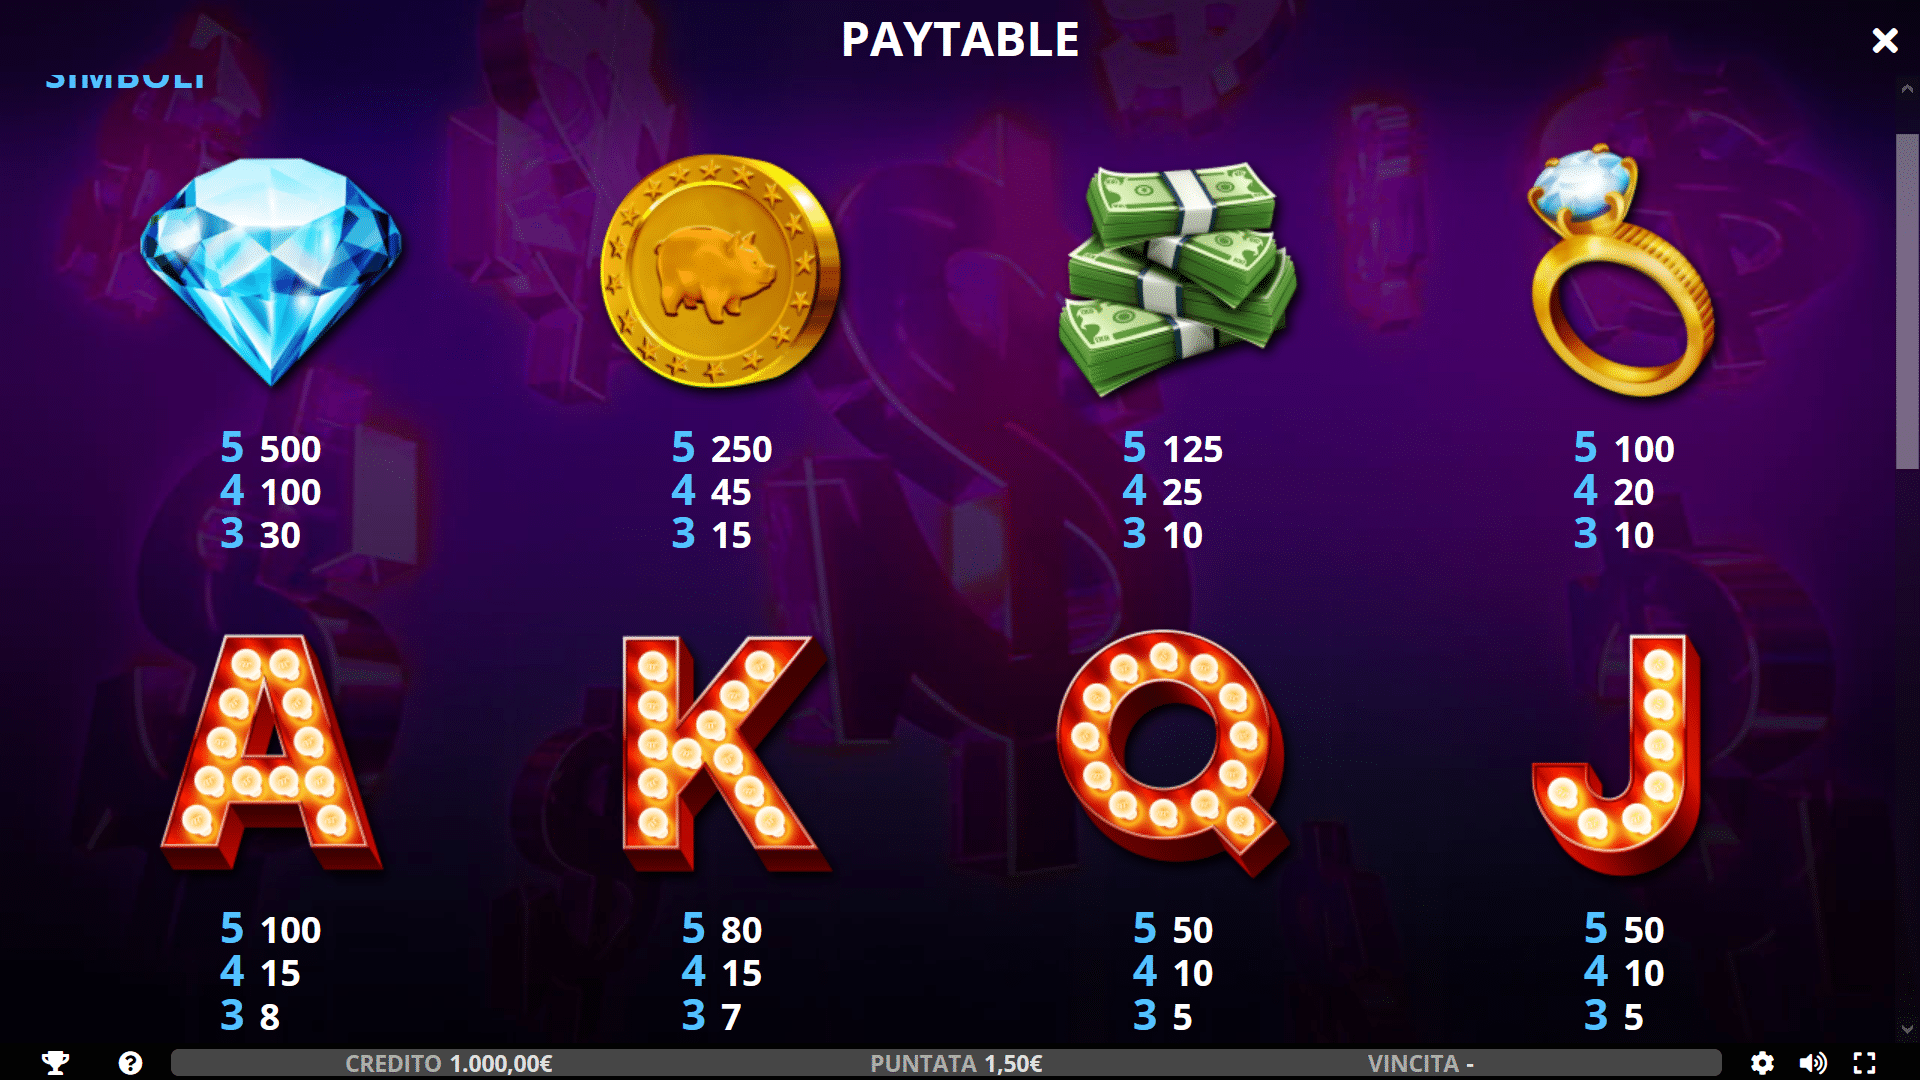 Paytable della slot gratis Money Pig